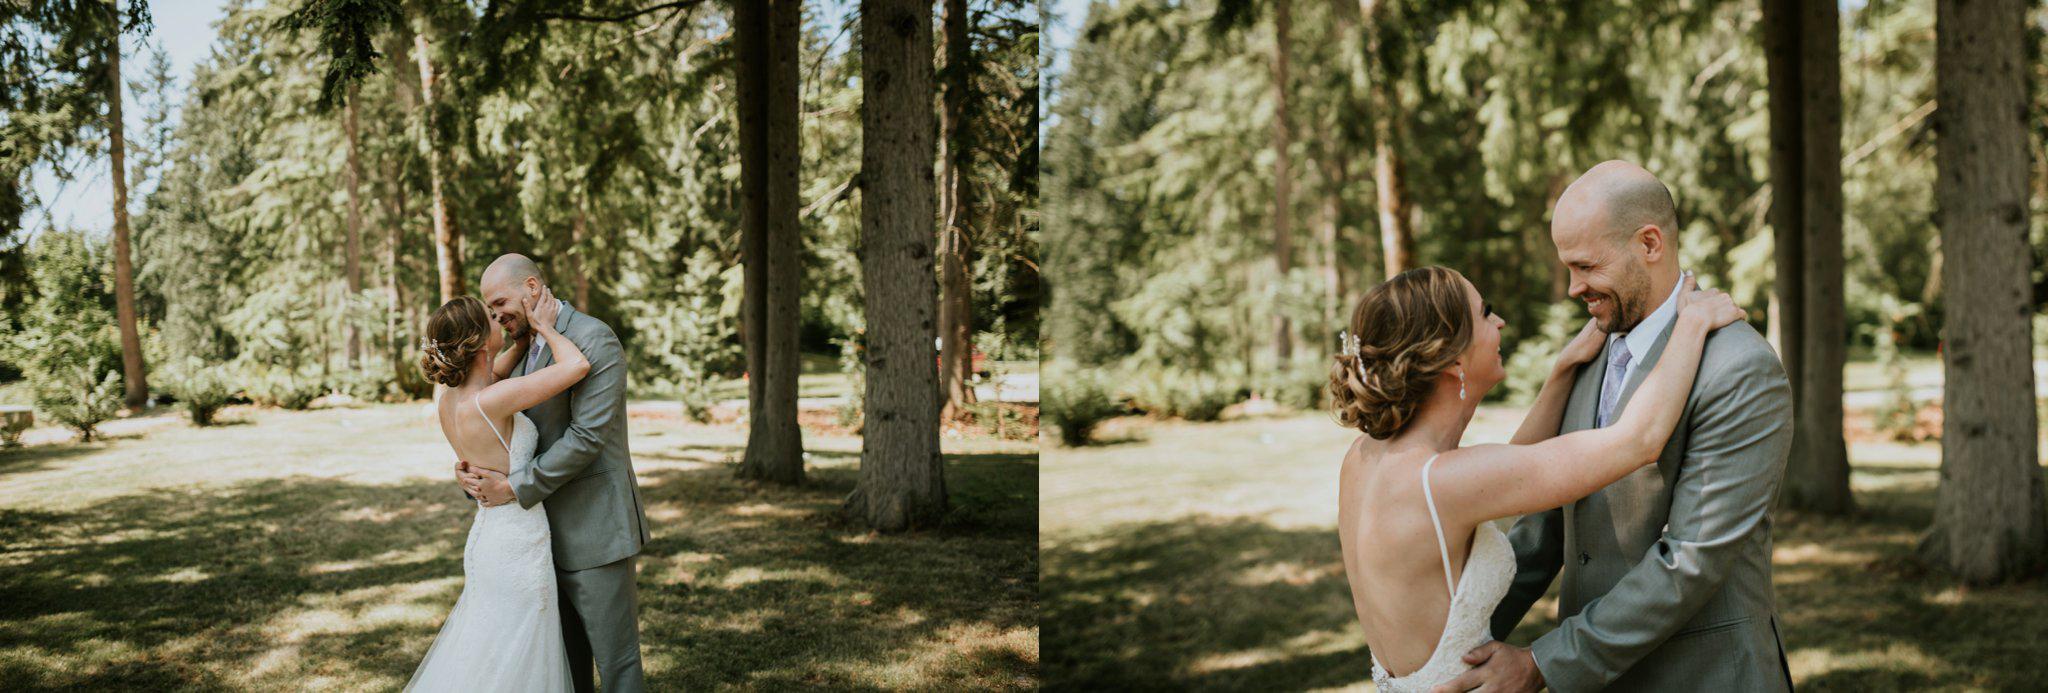 hollywood-school-house-wedding-seattle-photographer-caitlyn-nikula-35.jpg